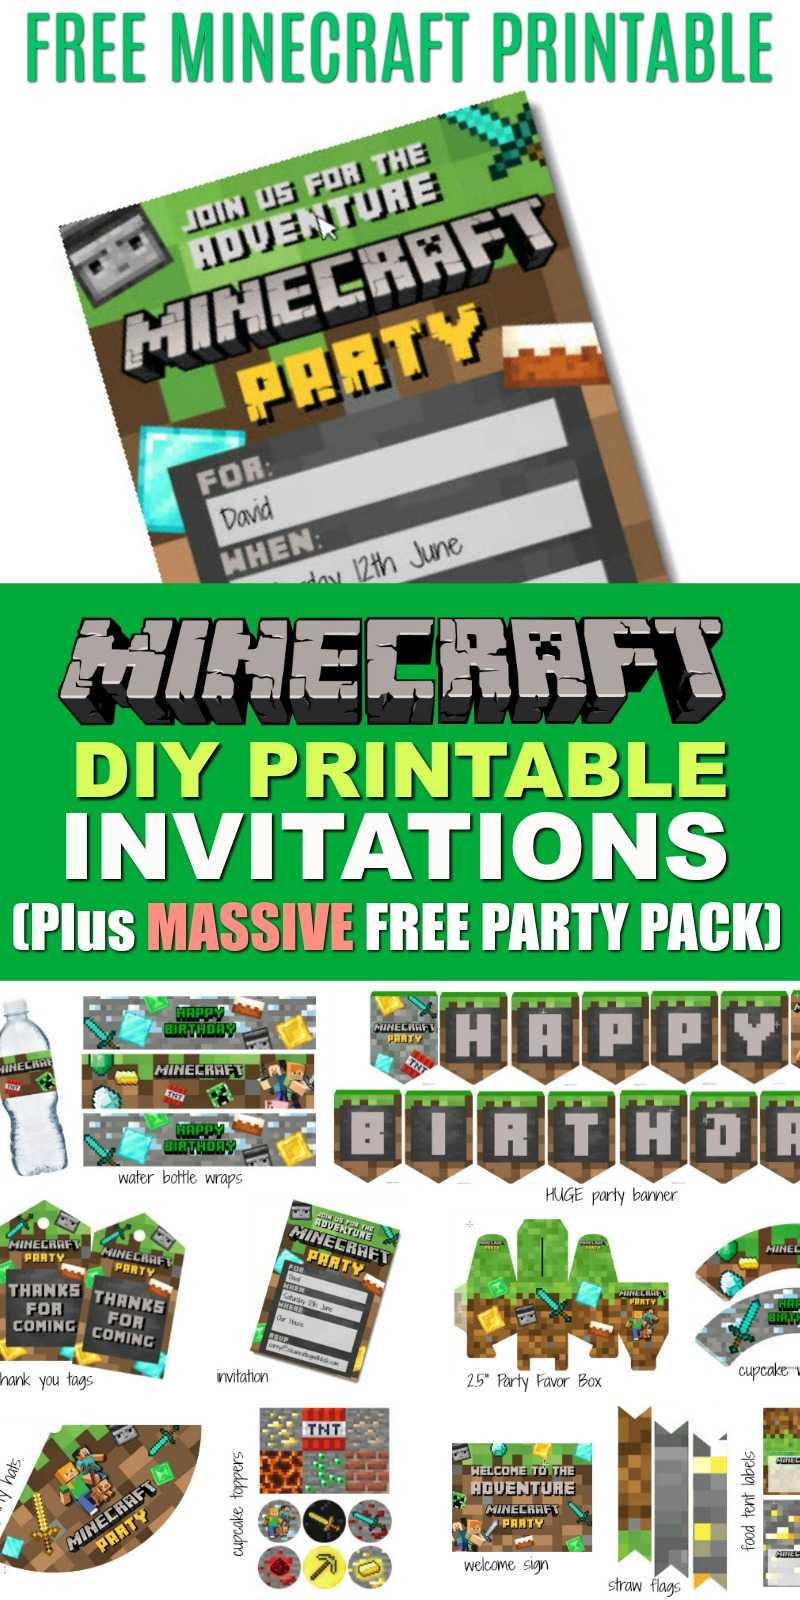 Free Diy Printable Minecraft Birthday Invitation - Clean In Minecraft Birthday Card Template